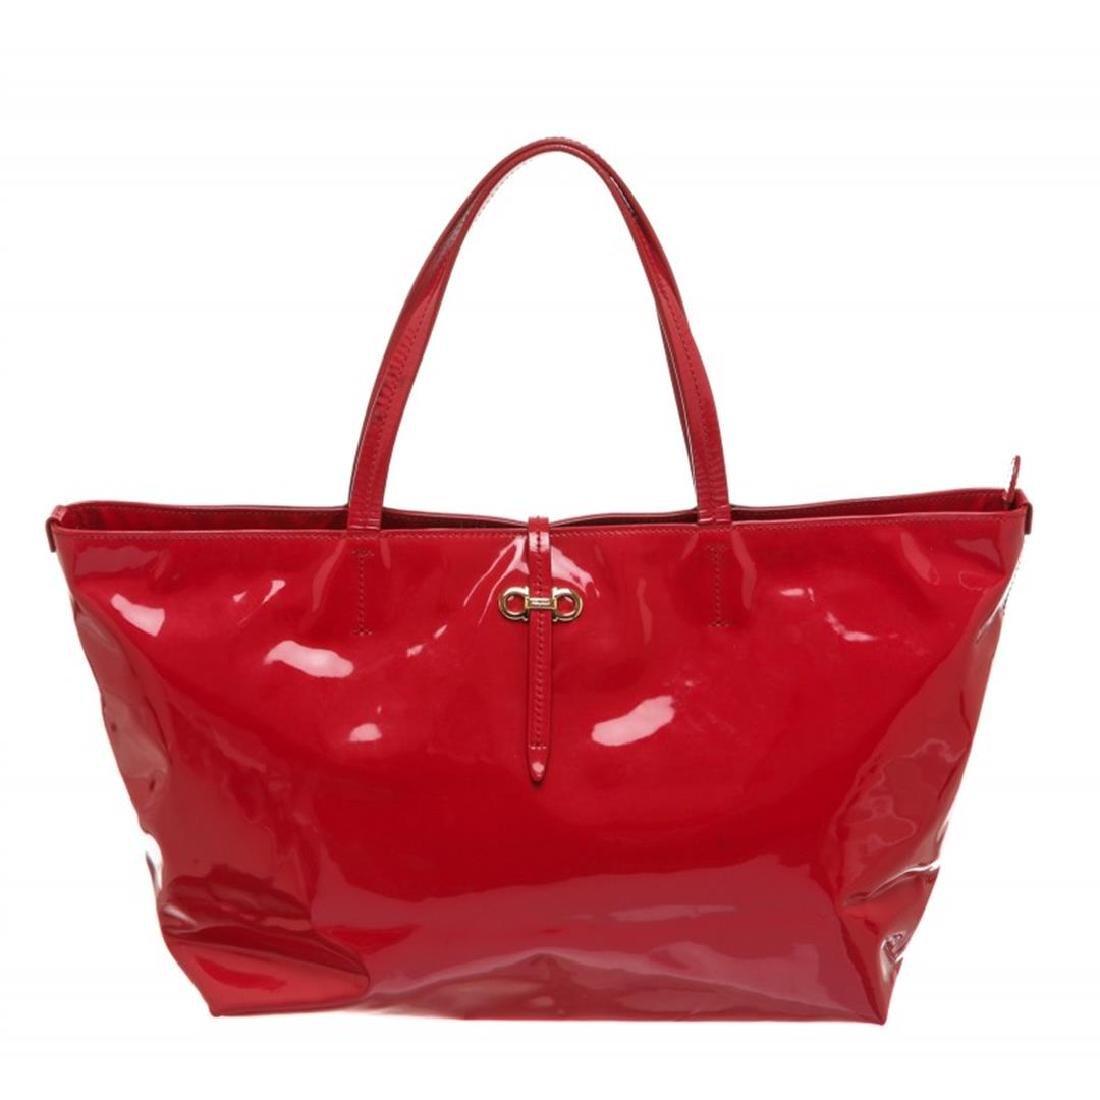 Salvatore Ferragamo Vinyl Red Tote Shoulder Bag